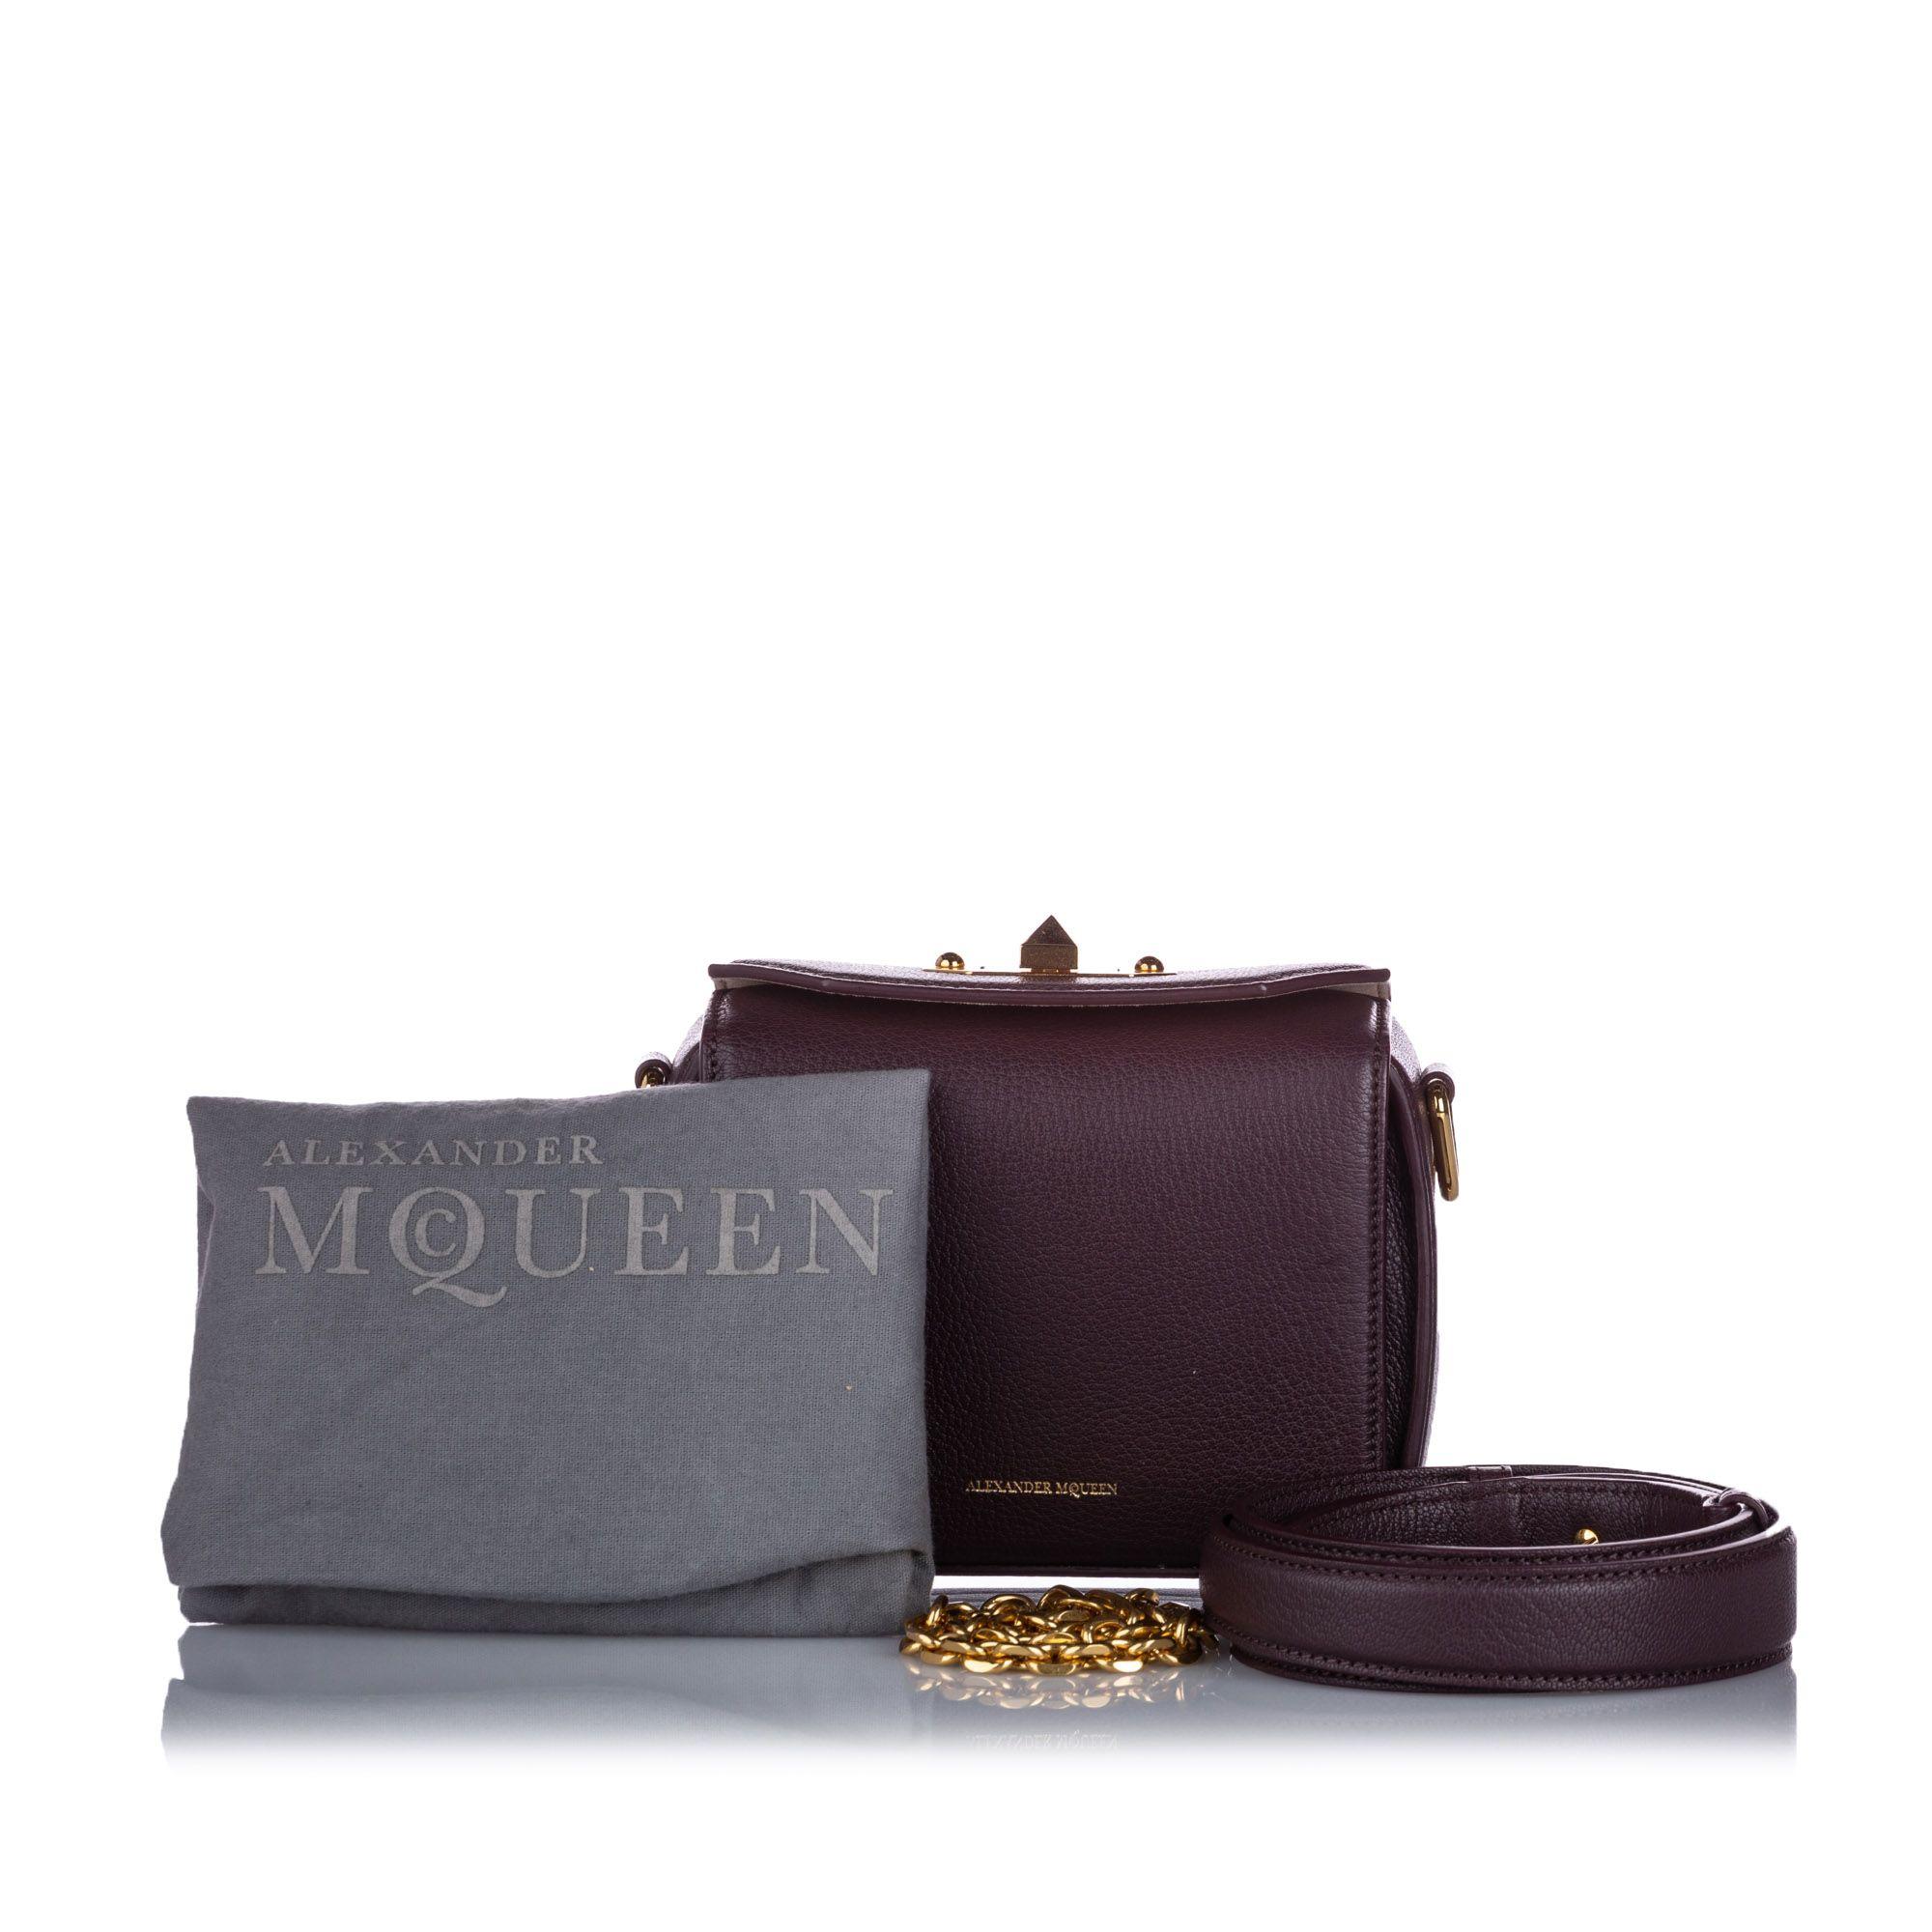 Alexander McQueen Box 16 Leather Crossbody Bag Red